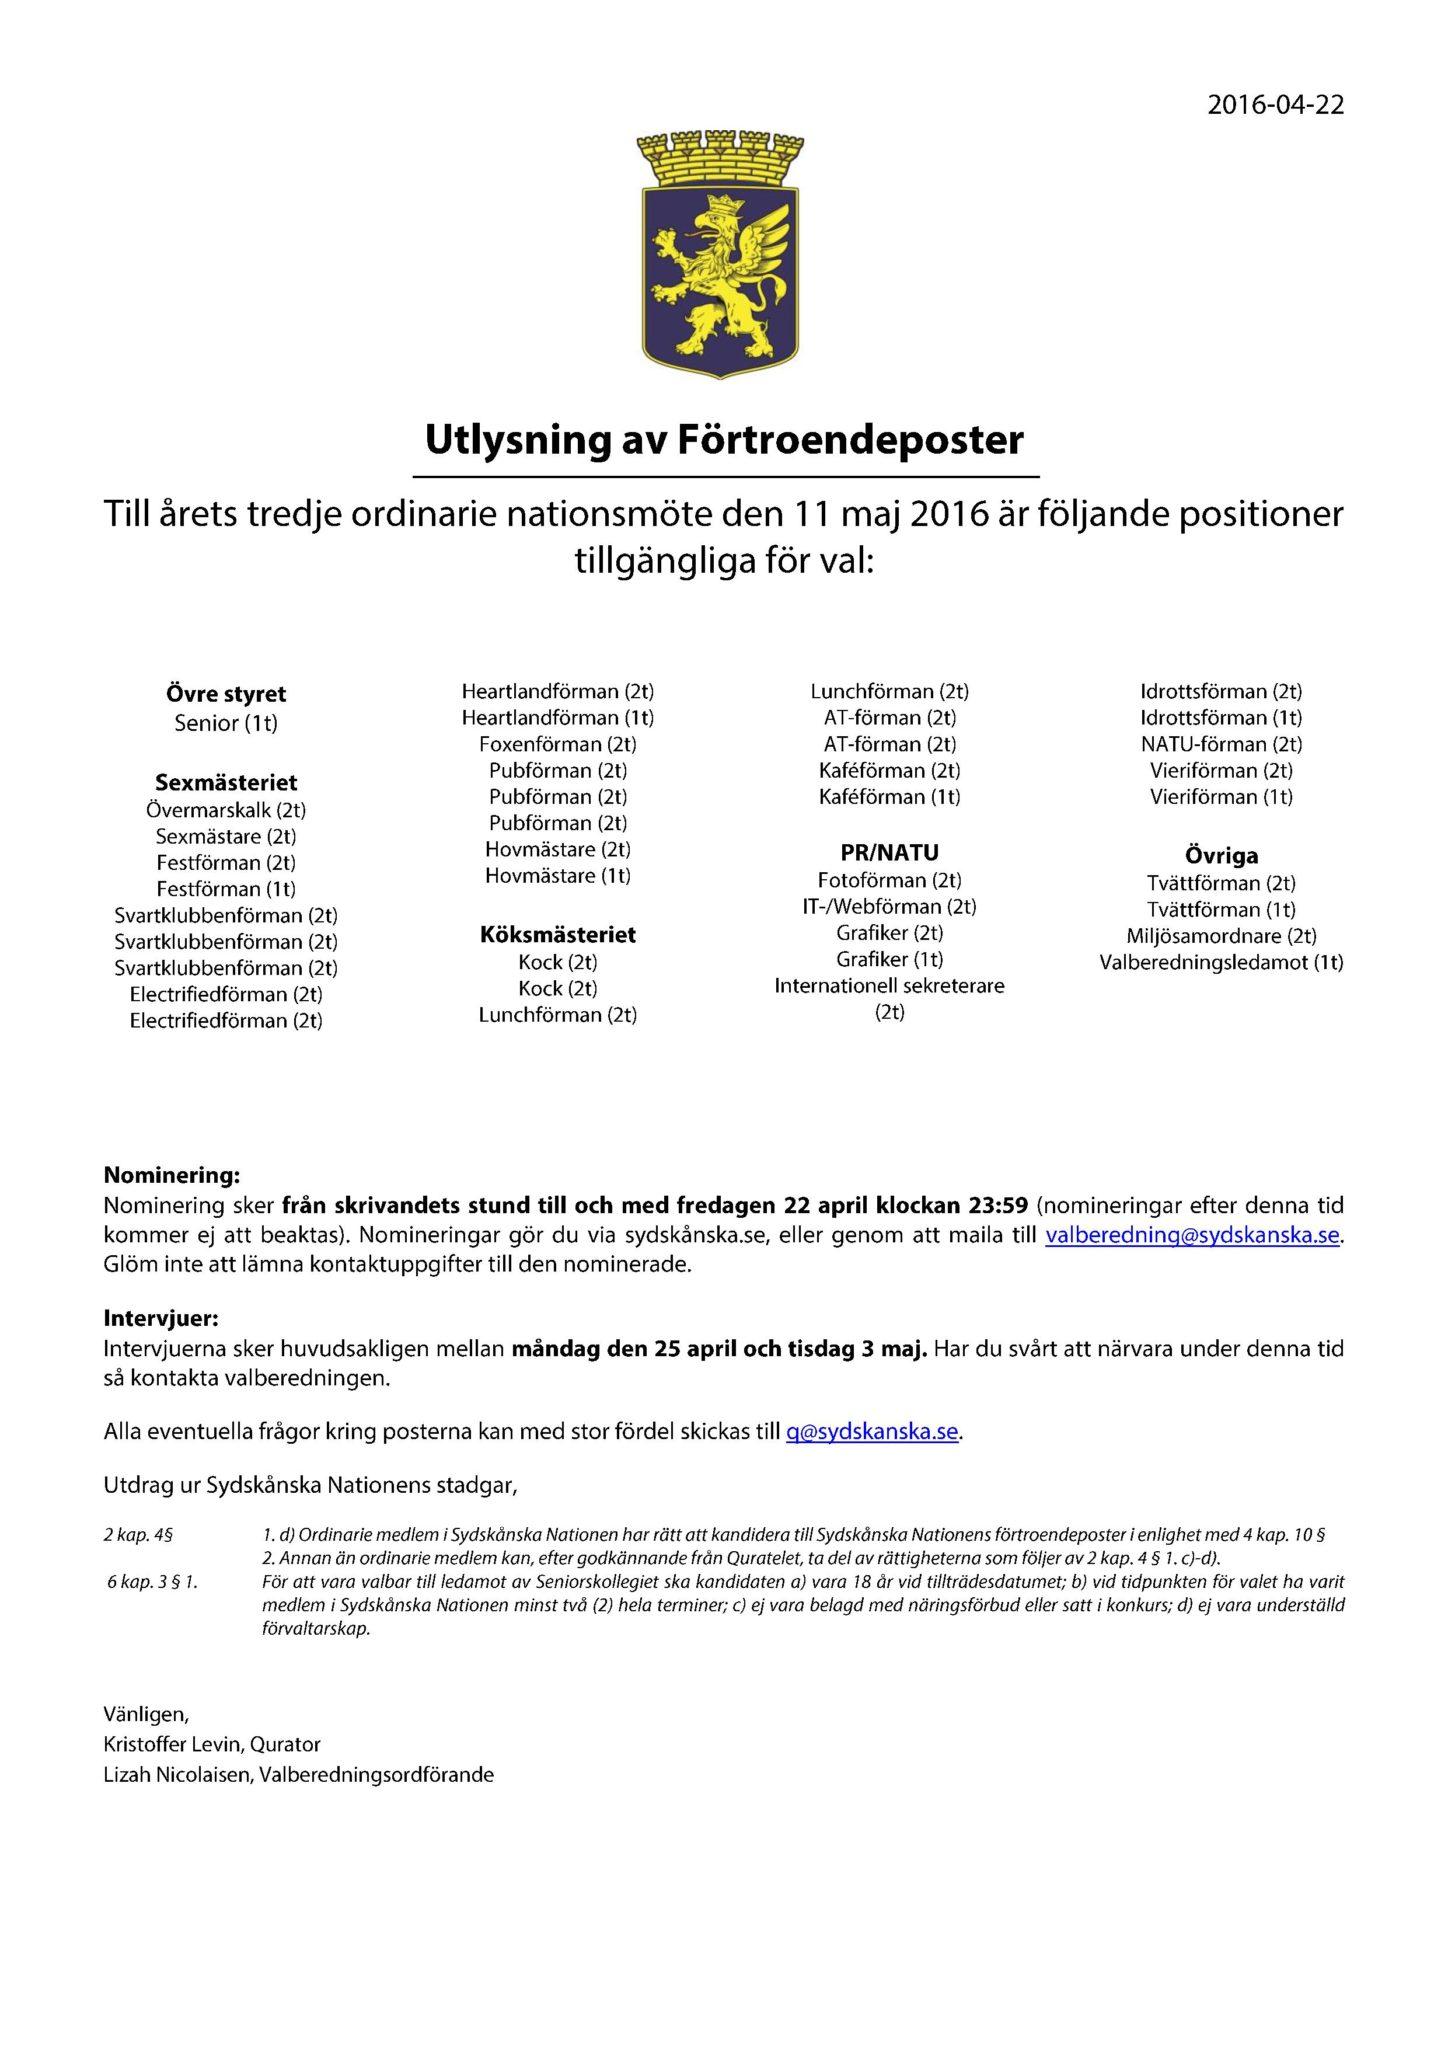 Utlysta poster 2016-05-11 uppdat